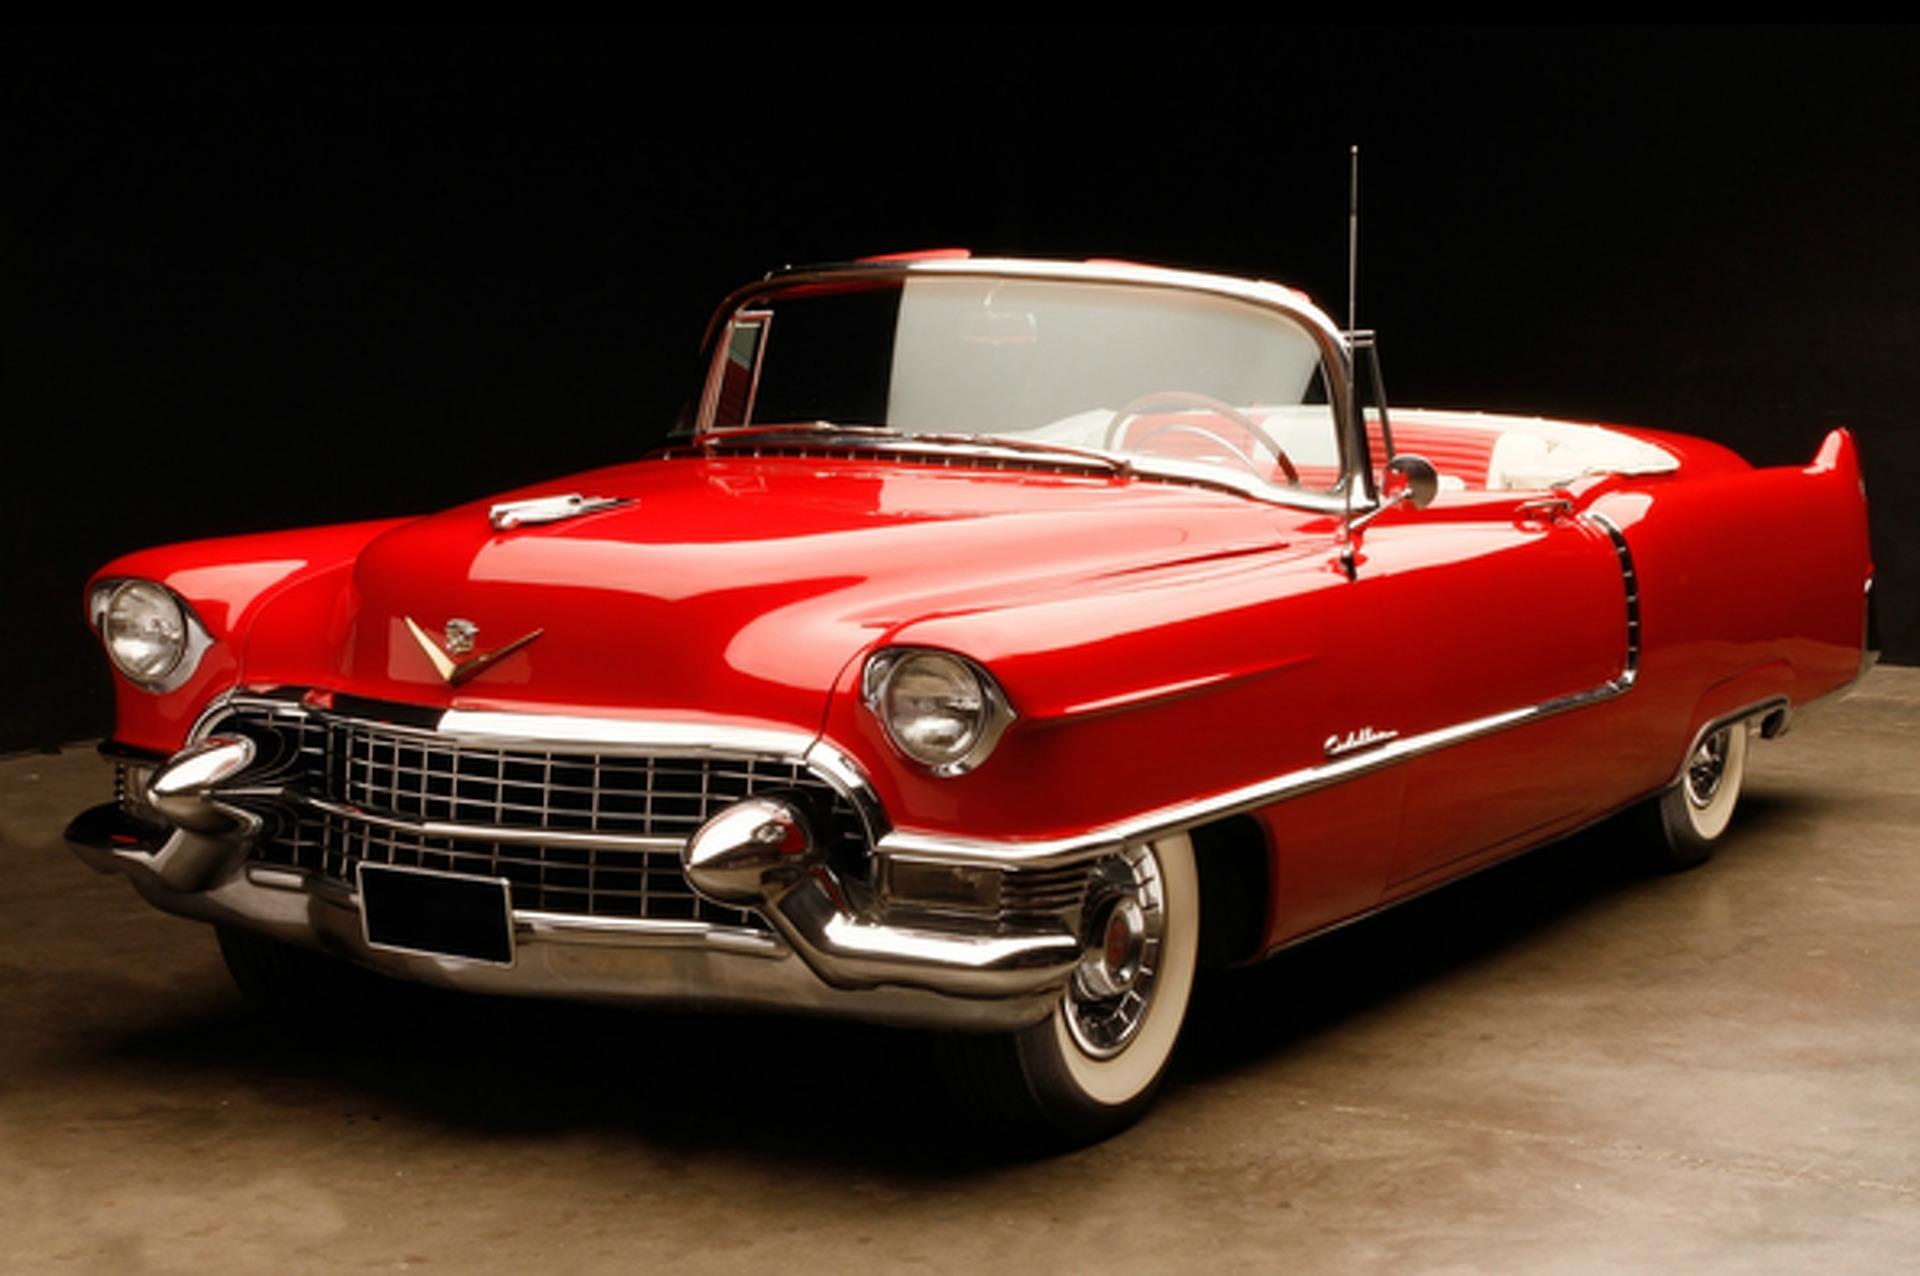 Wheels Wallpaper: 1954 Cadillac Series 62 Convertible Coupe